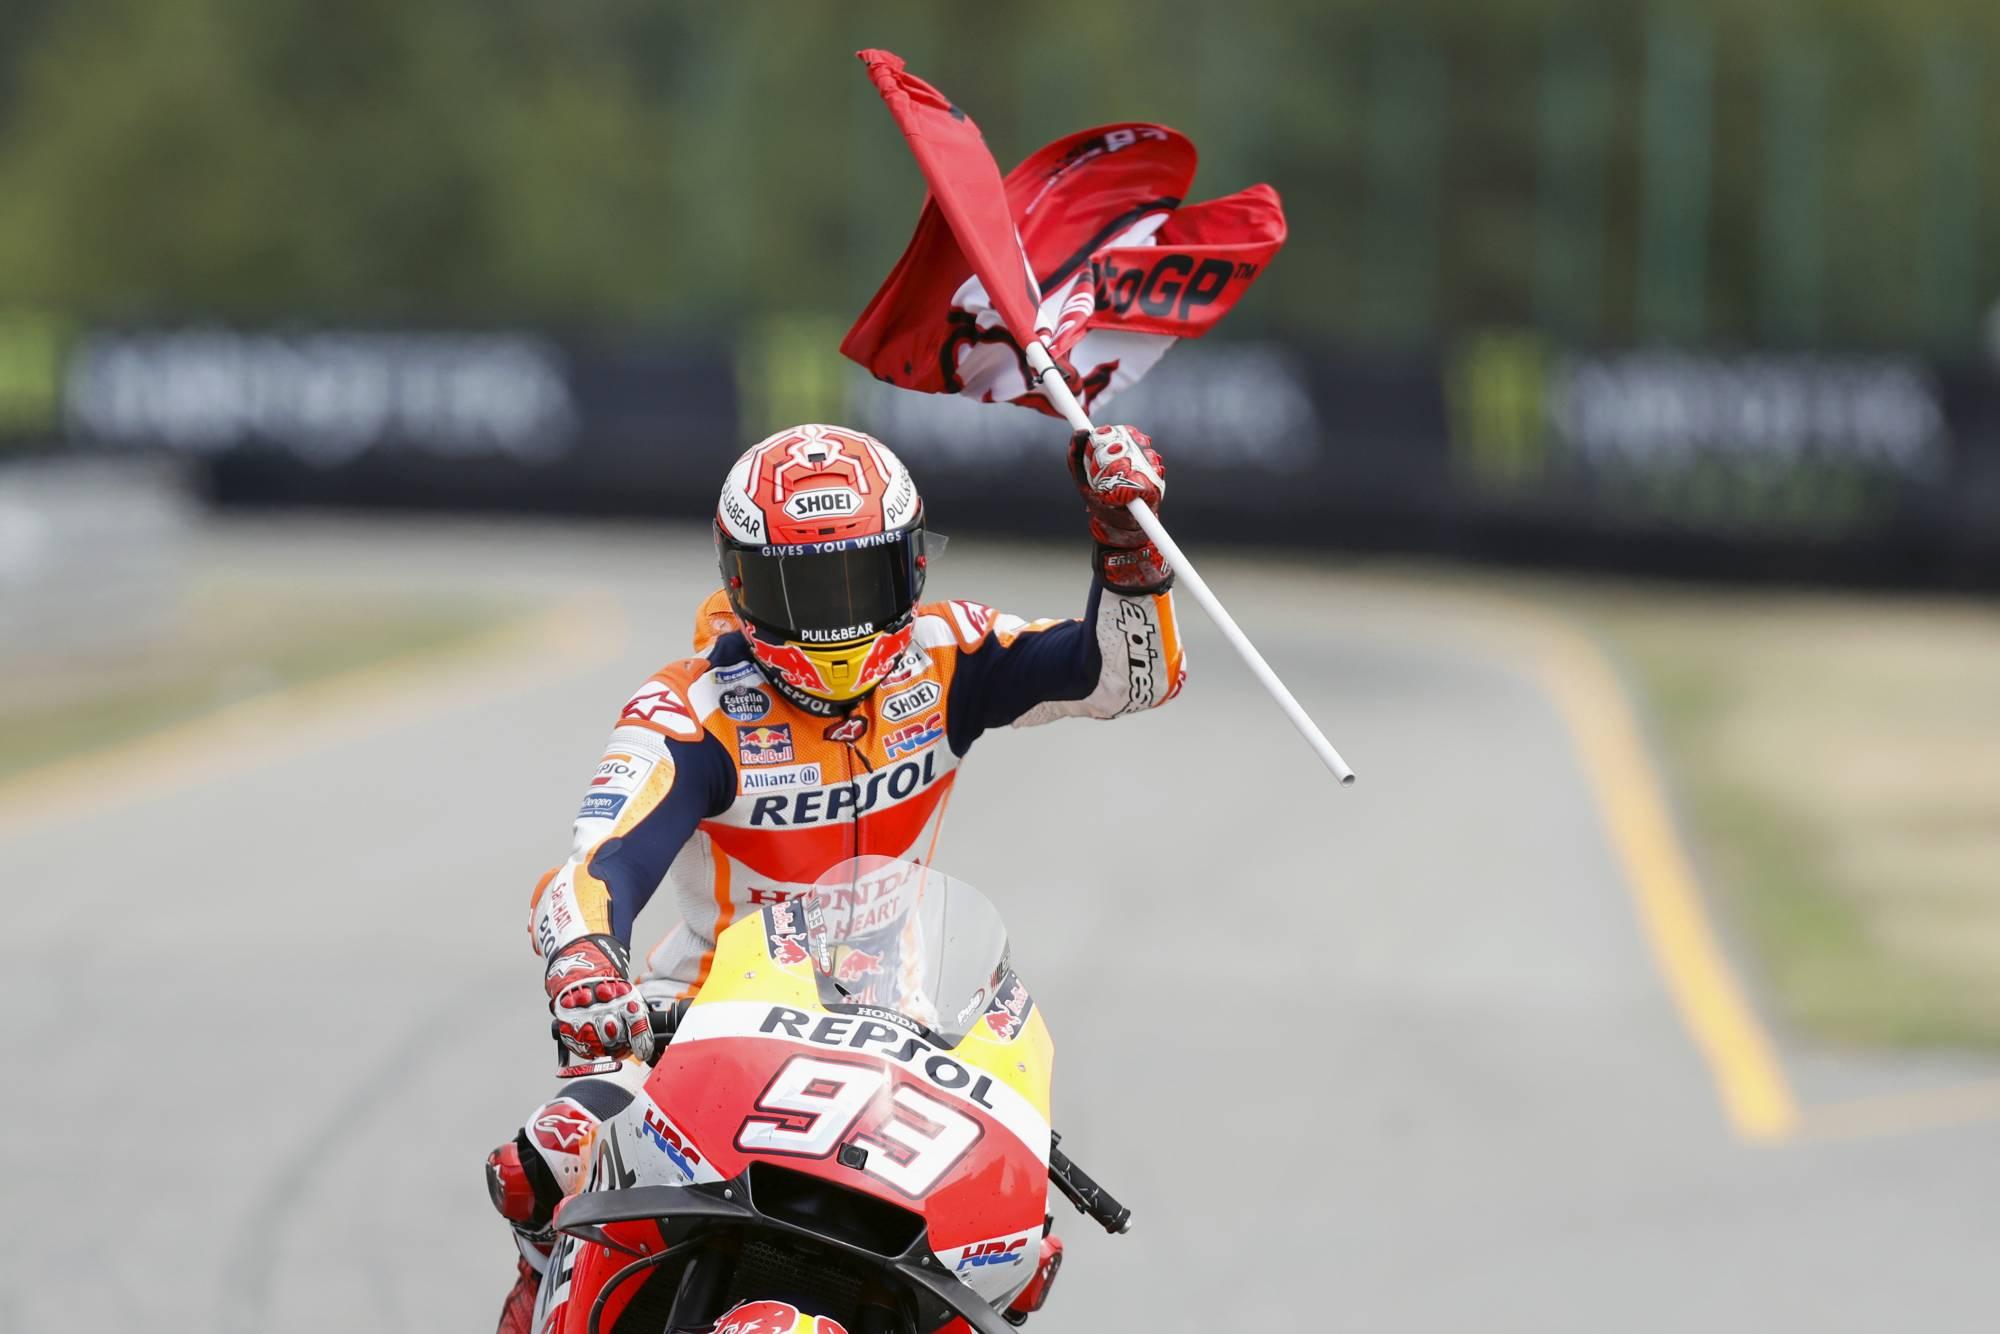 MotoGP champion Marquez edges Dovizioso for Austrian GP pole - FederalNewsRadio.com